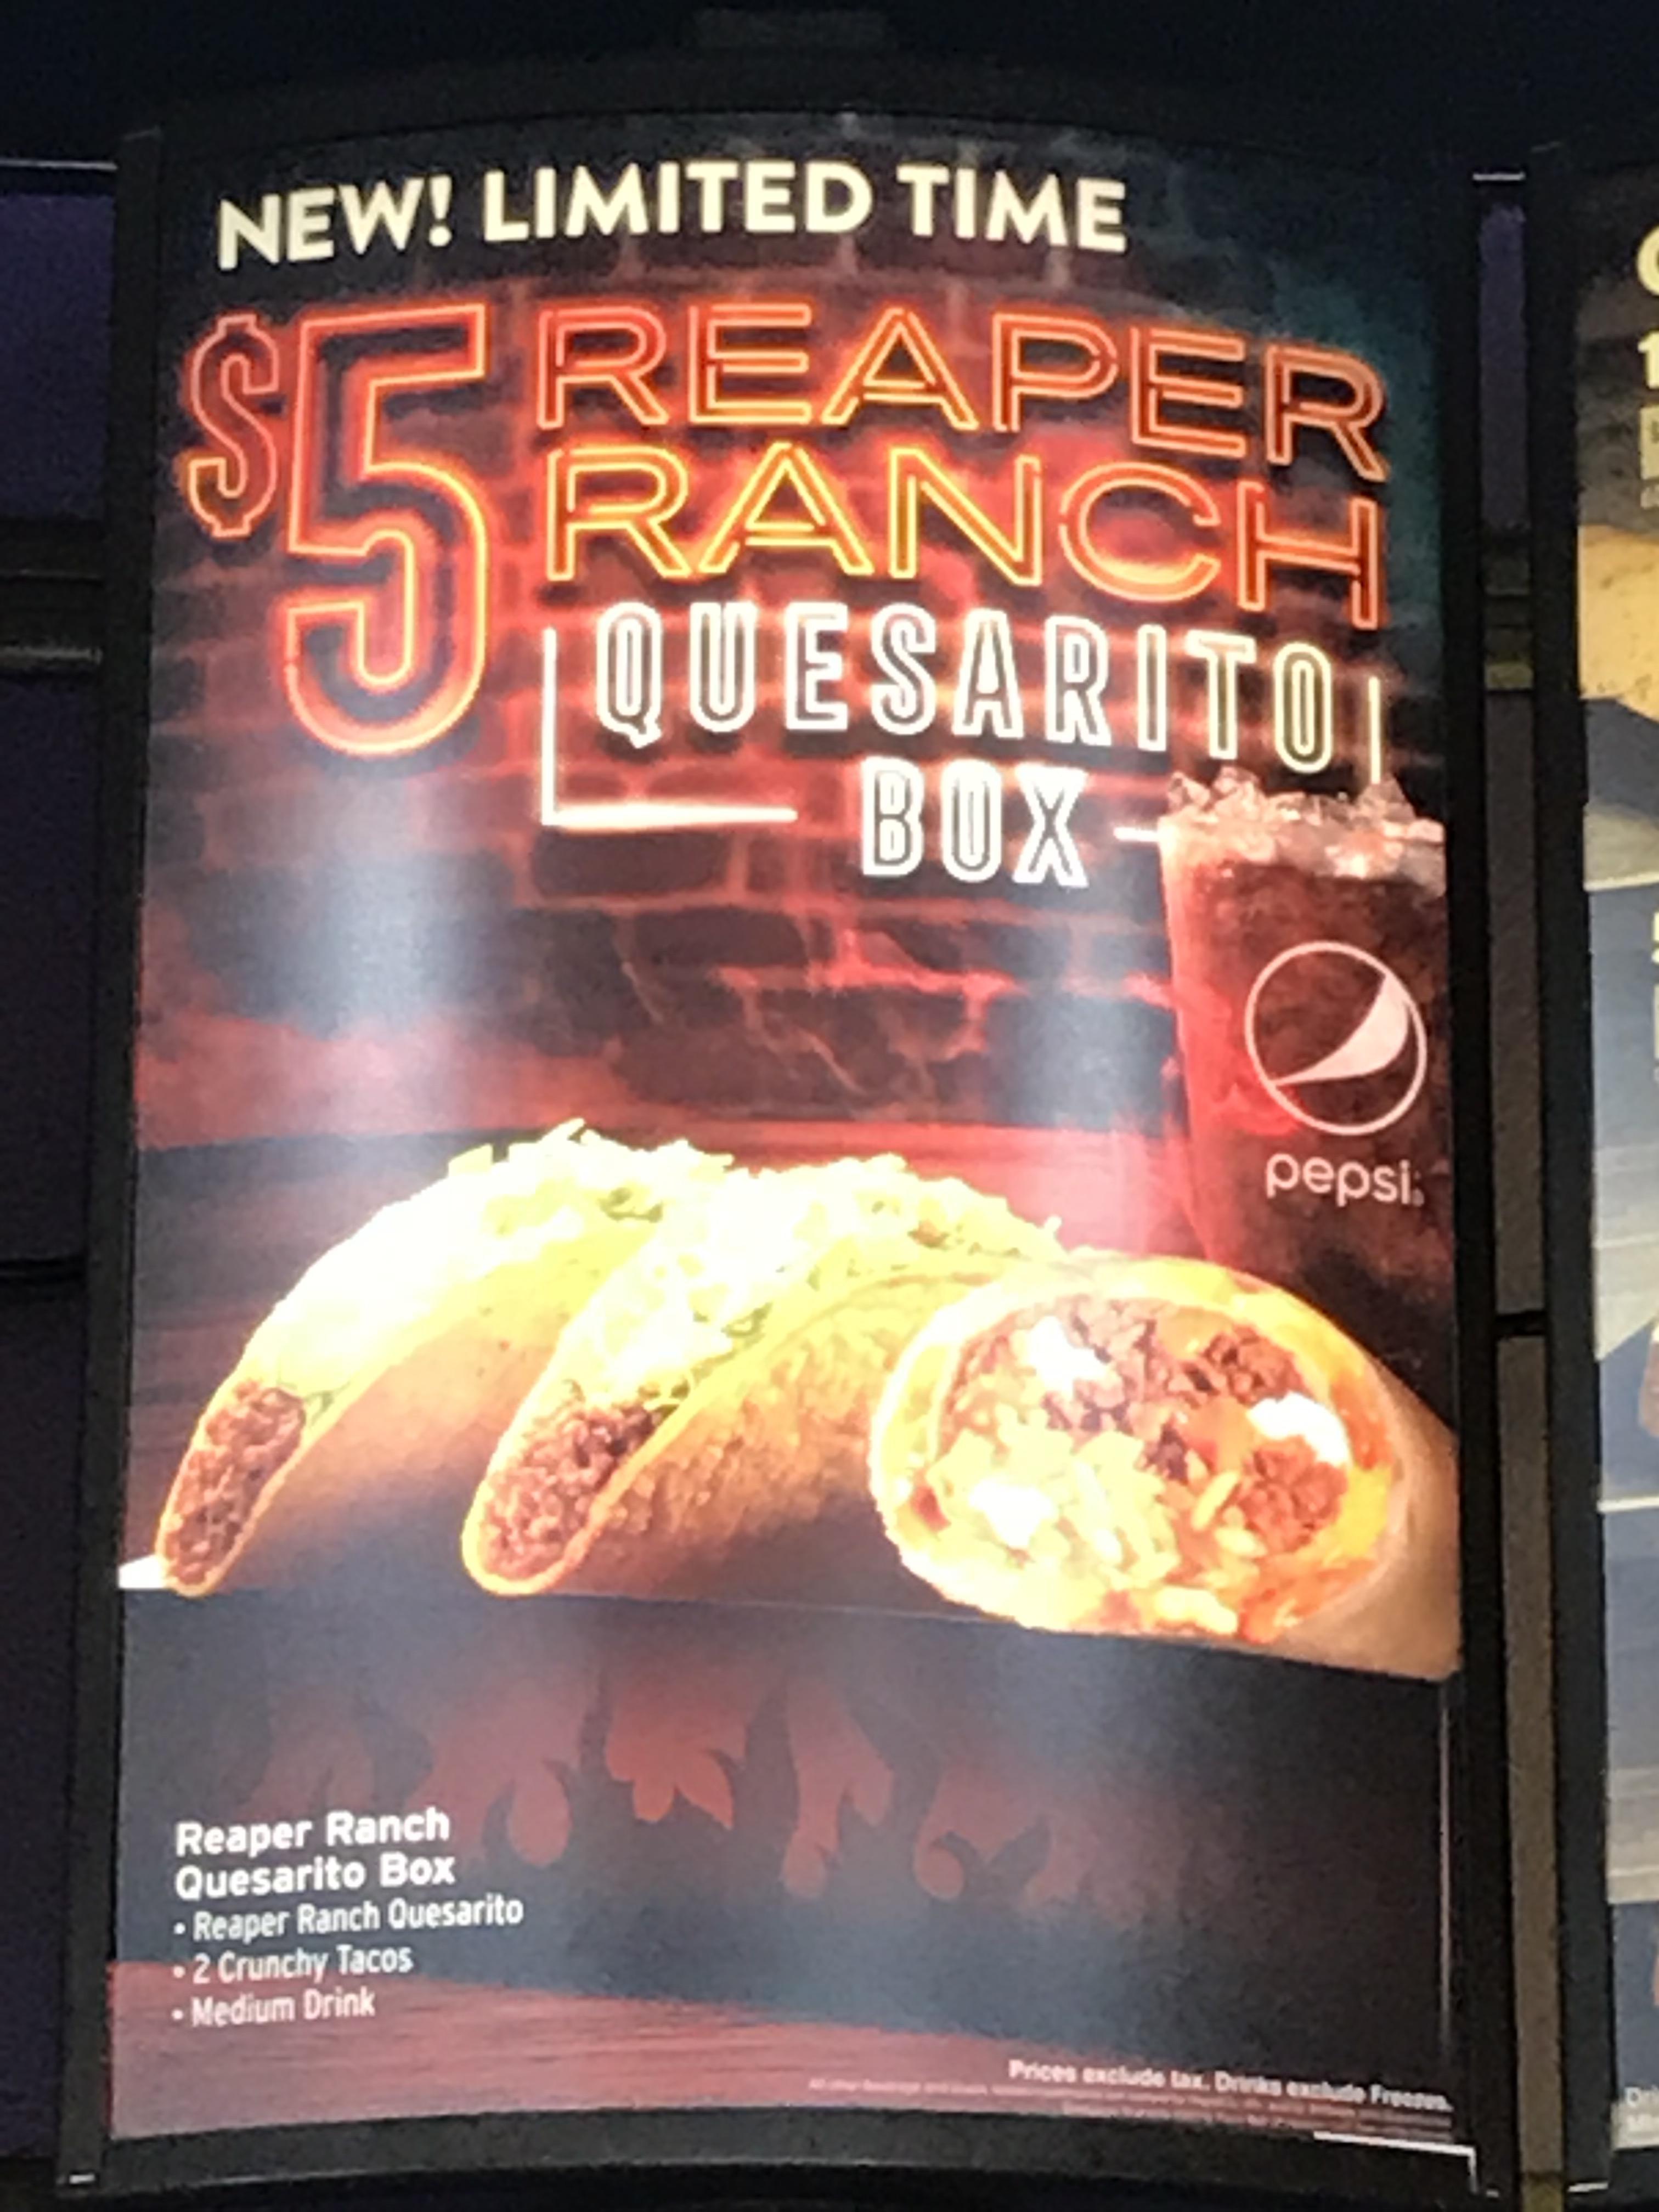 Wonderful Reaper Ranch Quesarito Box Reaper Ranch Quesarito Box Wi Tacobell Quesarito Taco Bell Box Quesarito Taco Bell Sauce nice food Quesarito Taco Bell